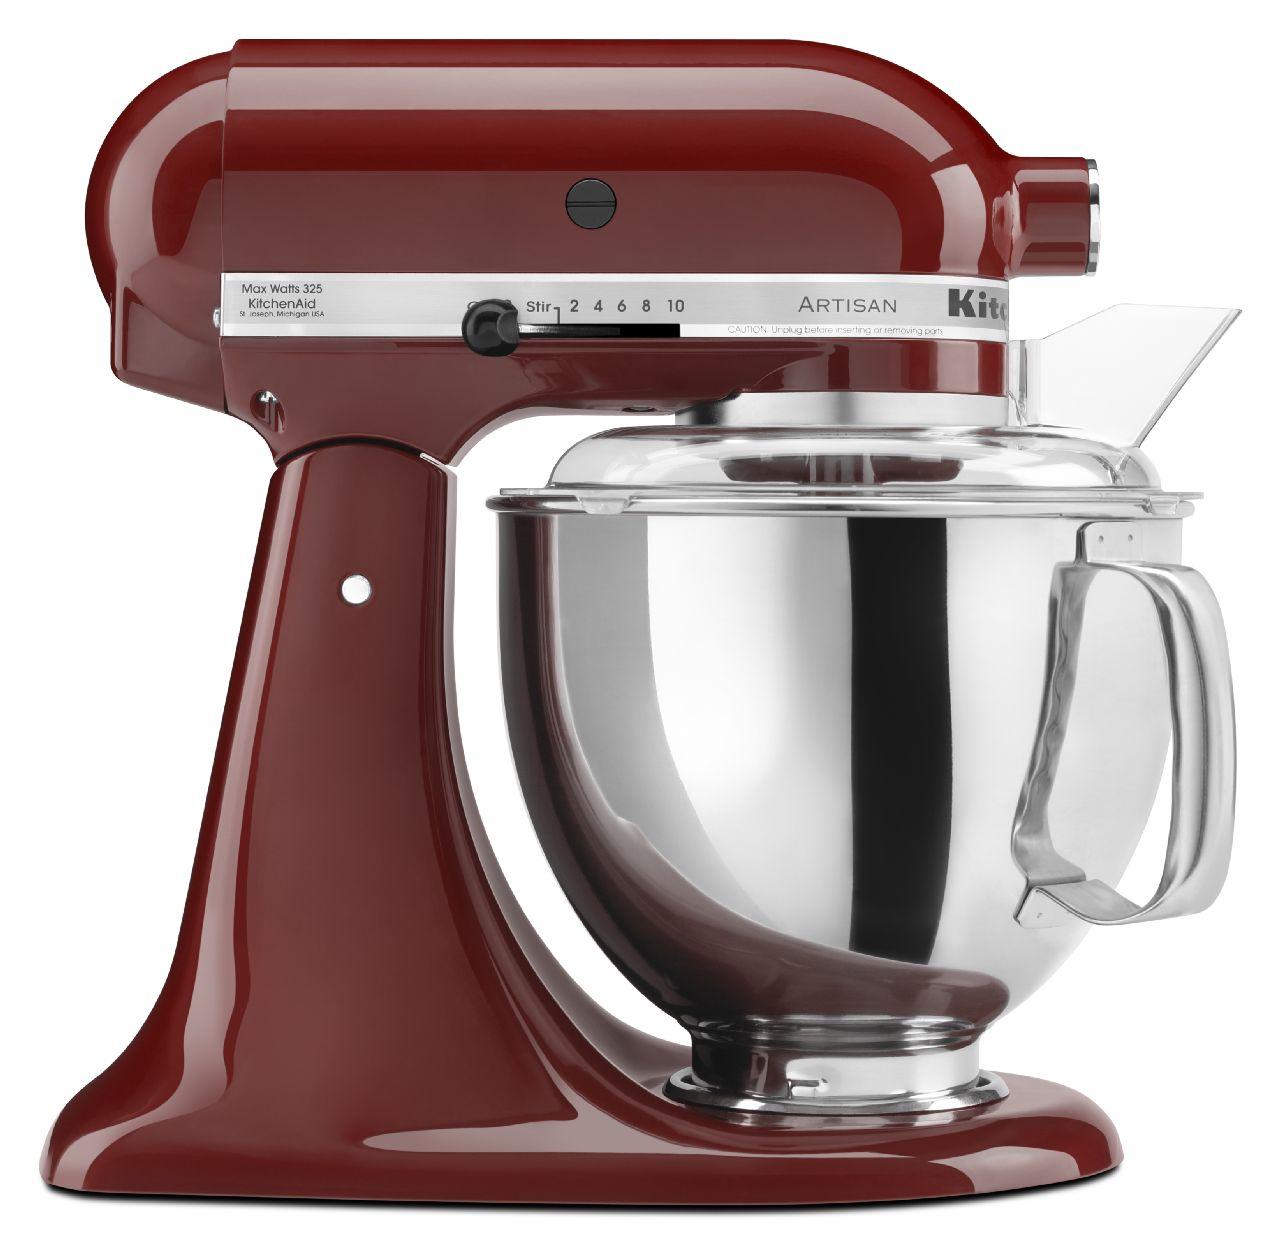 KitchenAid-Artisan-Series-5-Quart-Tilt-Head-Stand-Mixer-10-Speeds-KSM150PS thumbnail 57